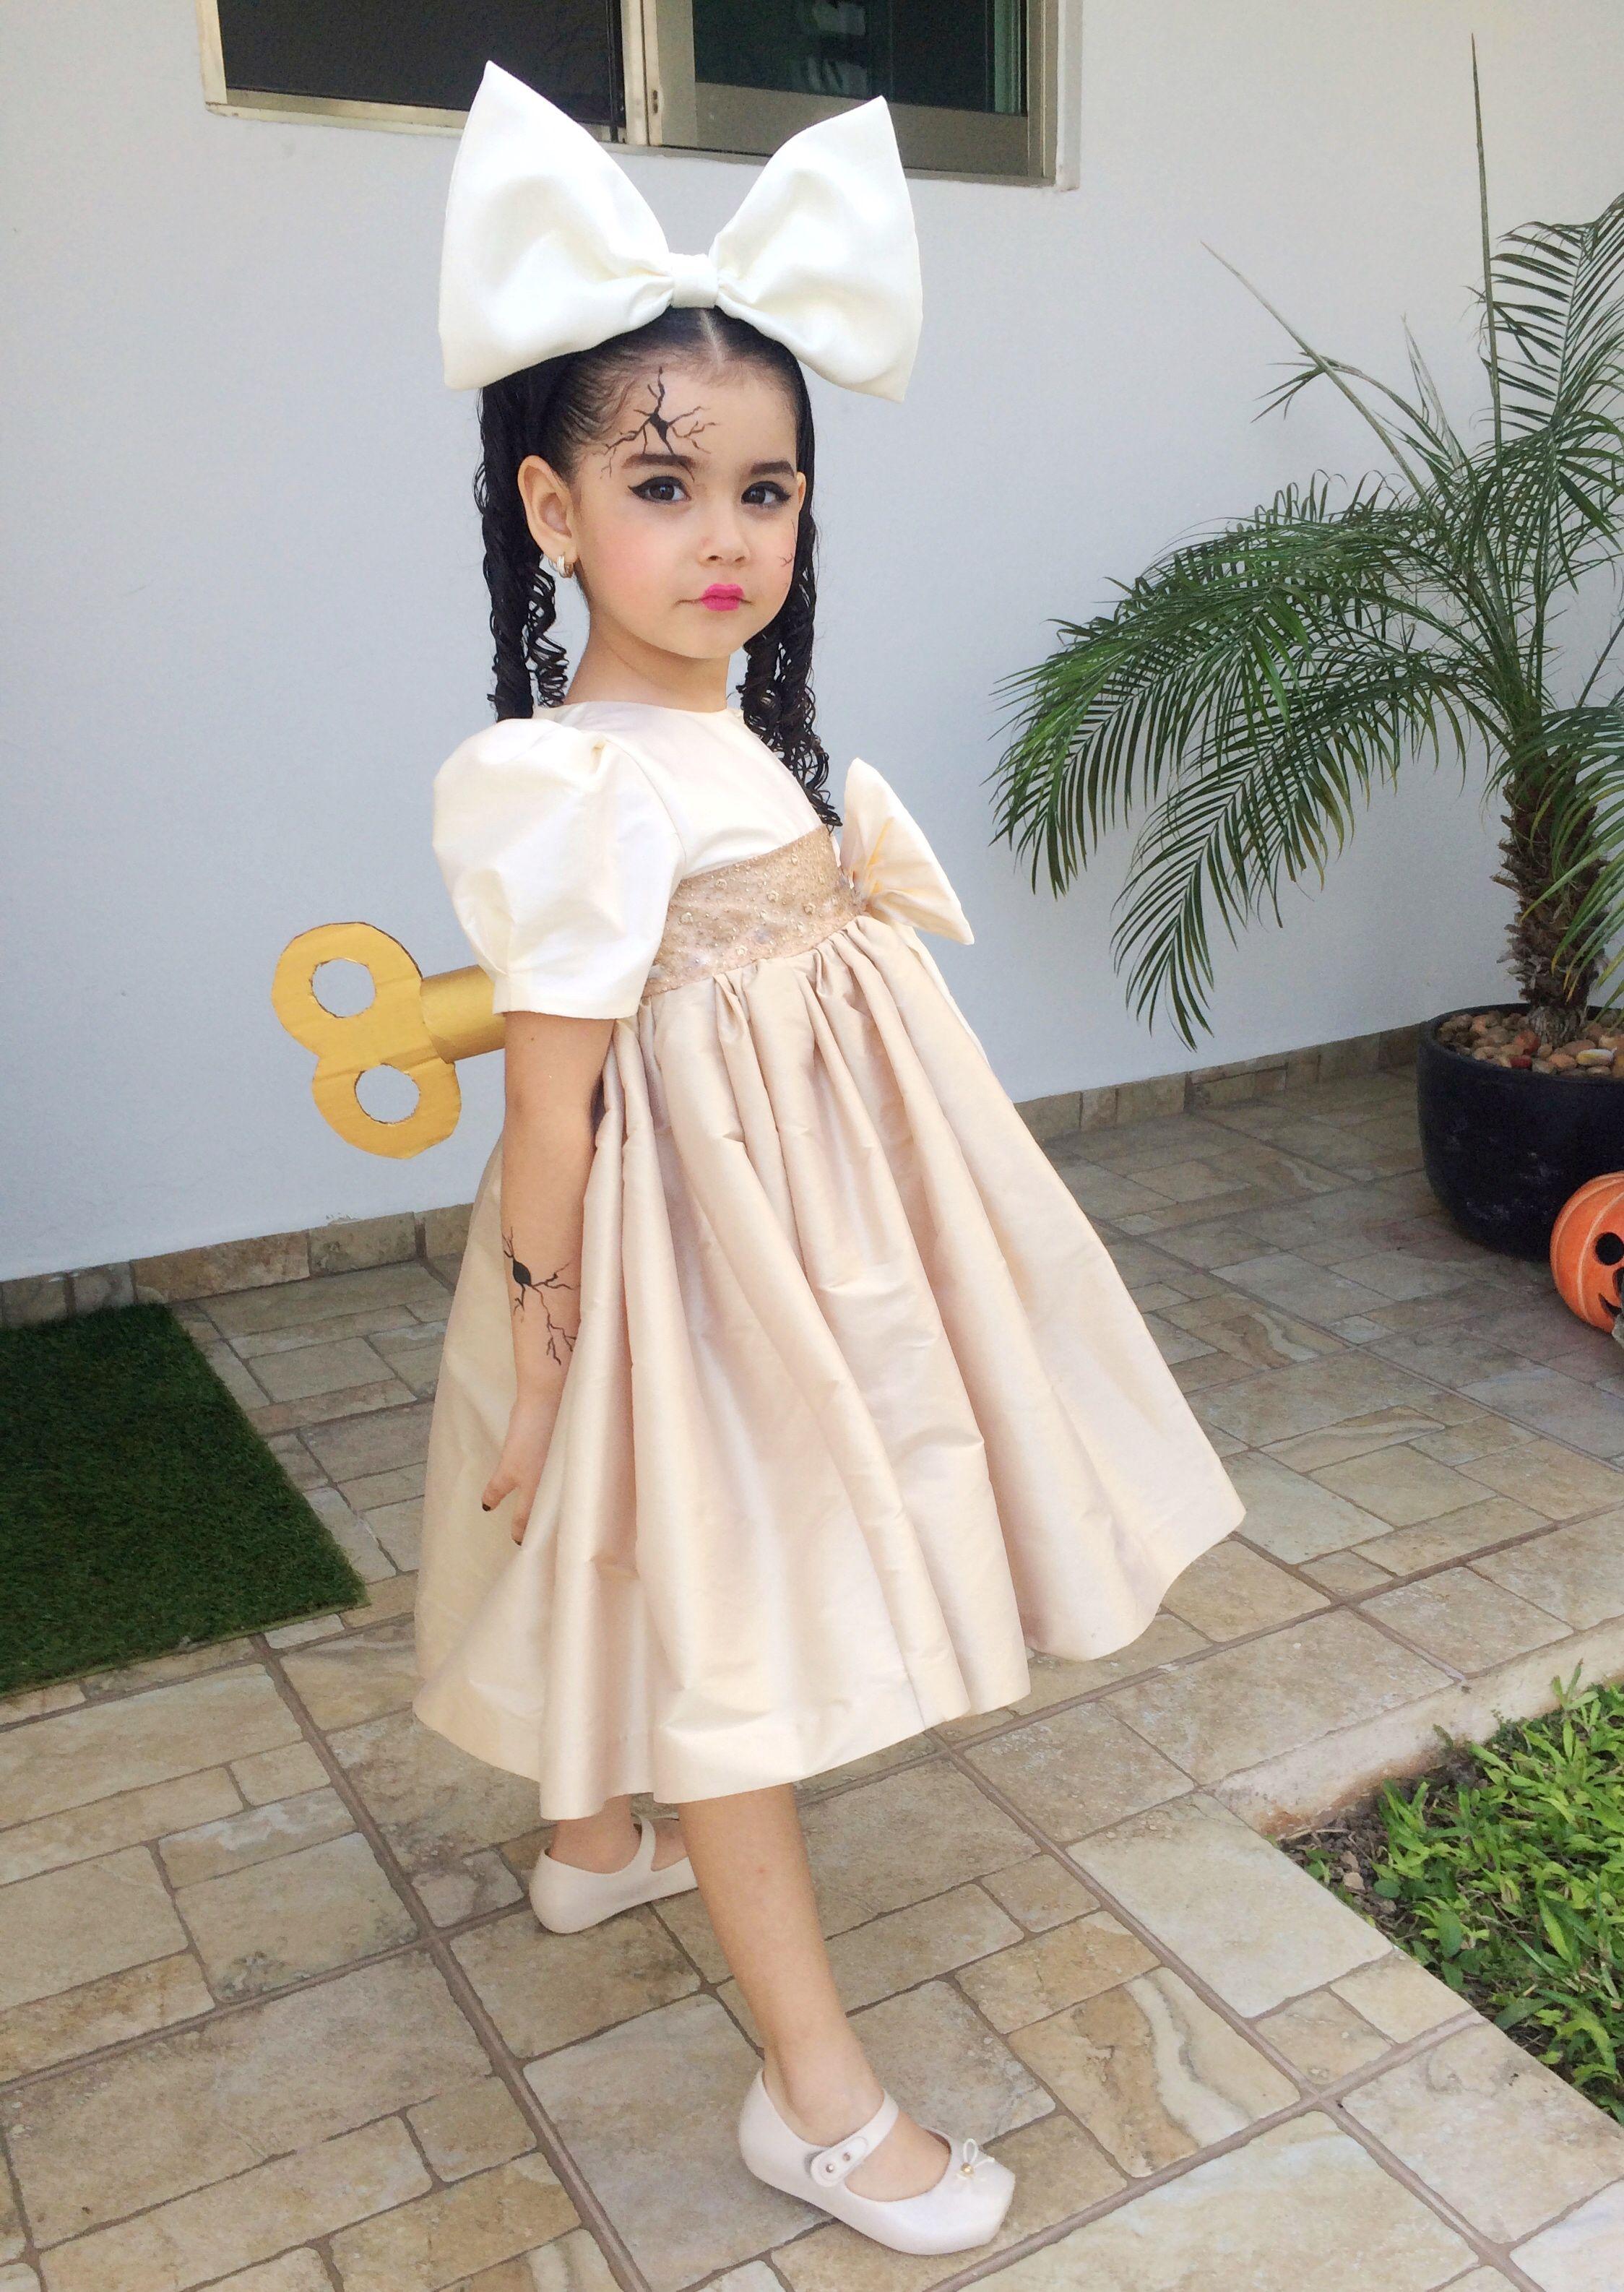 Image result for wind up doll costume diy